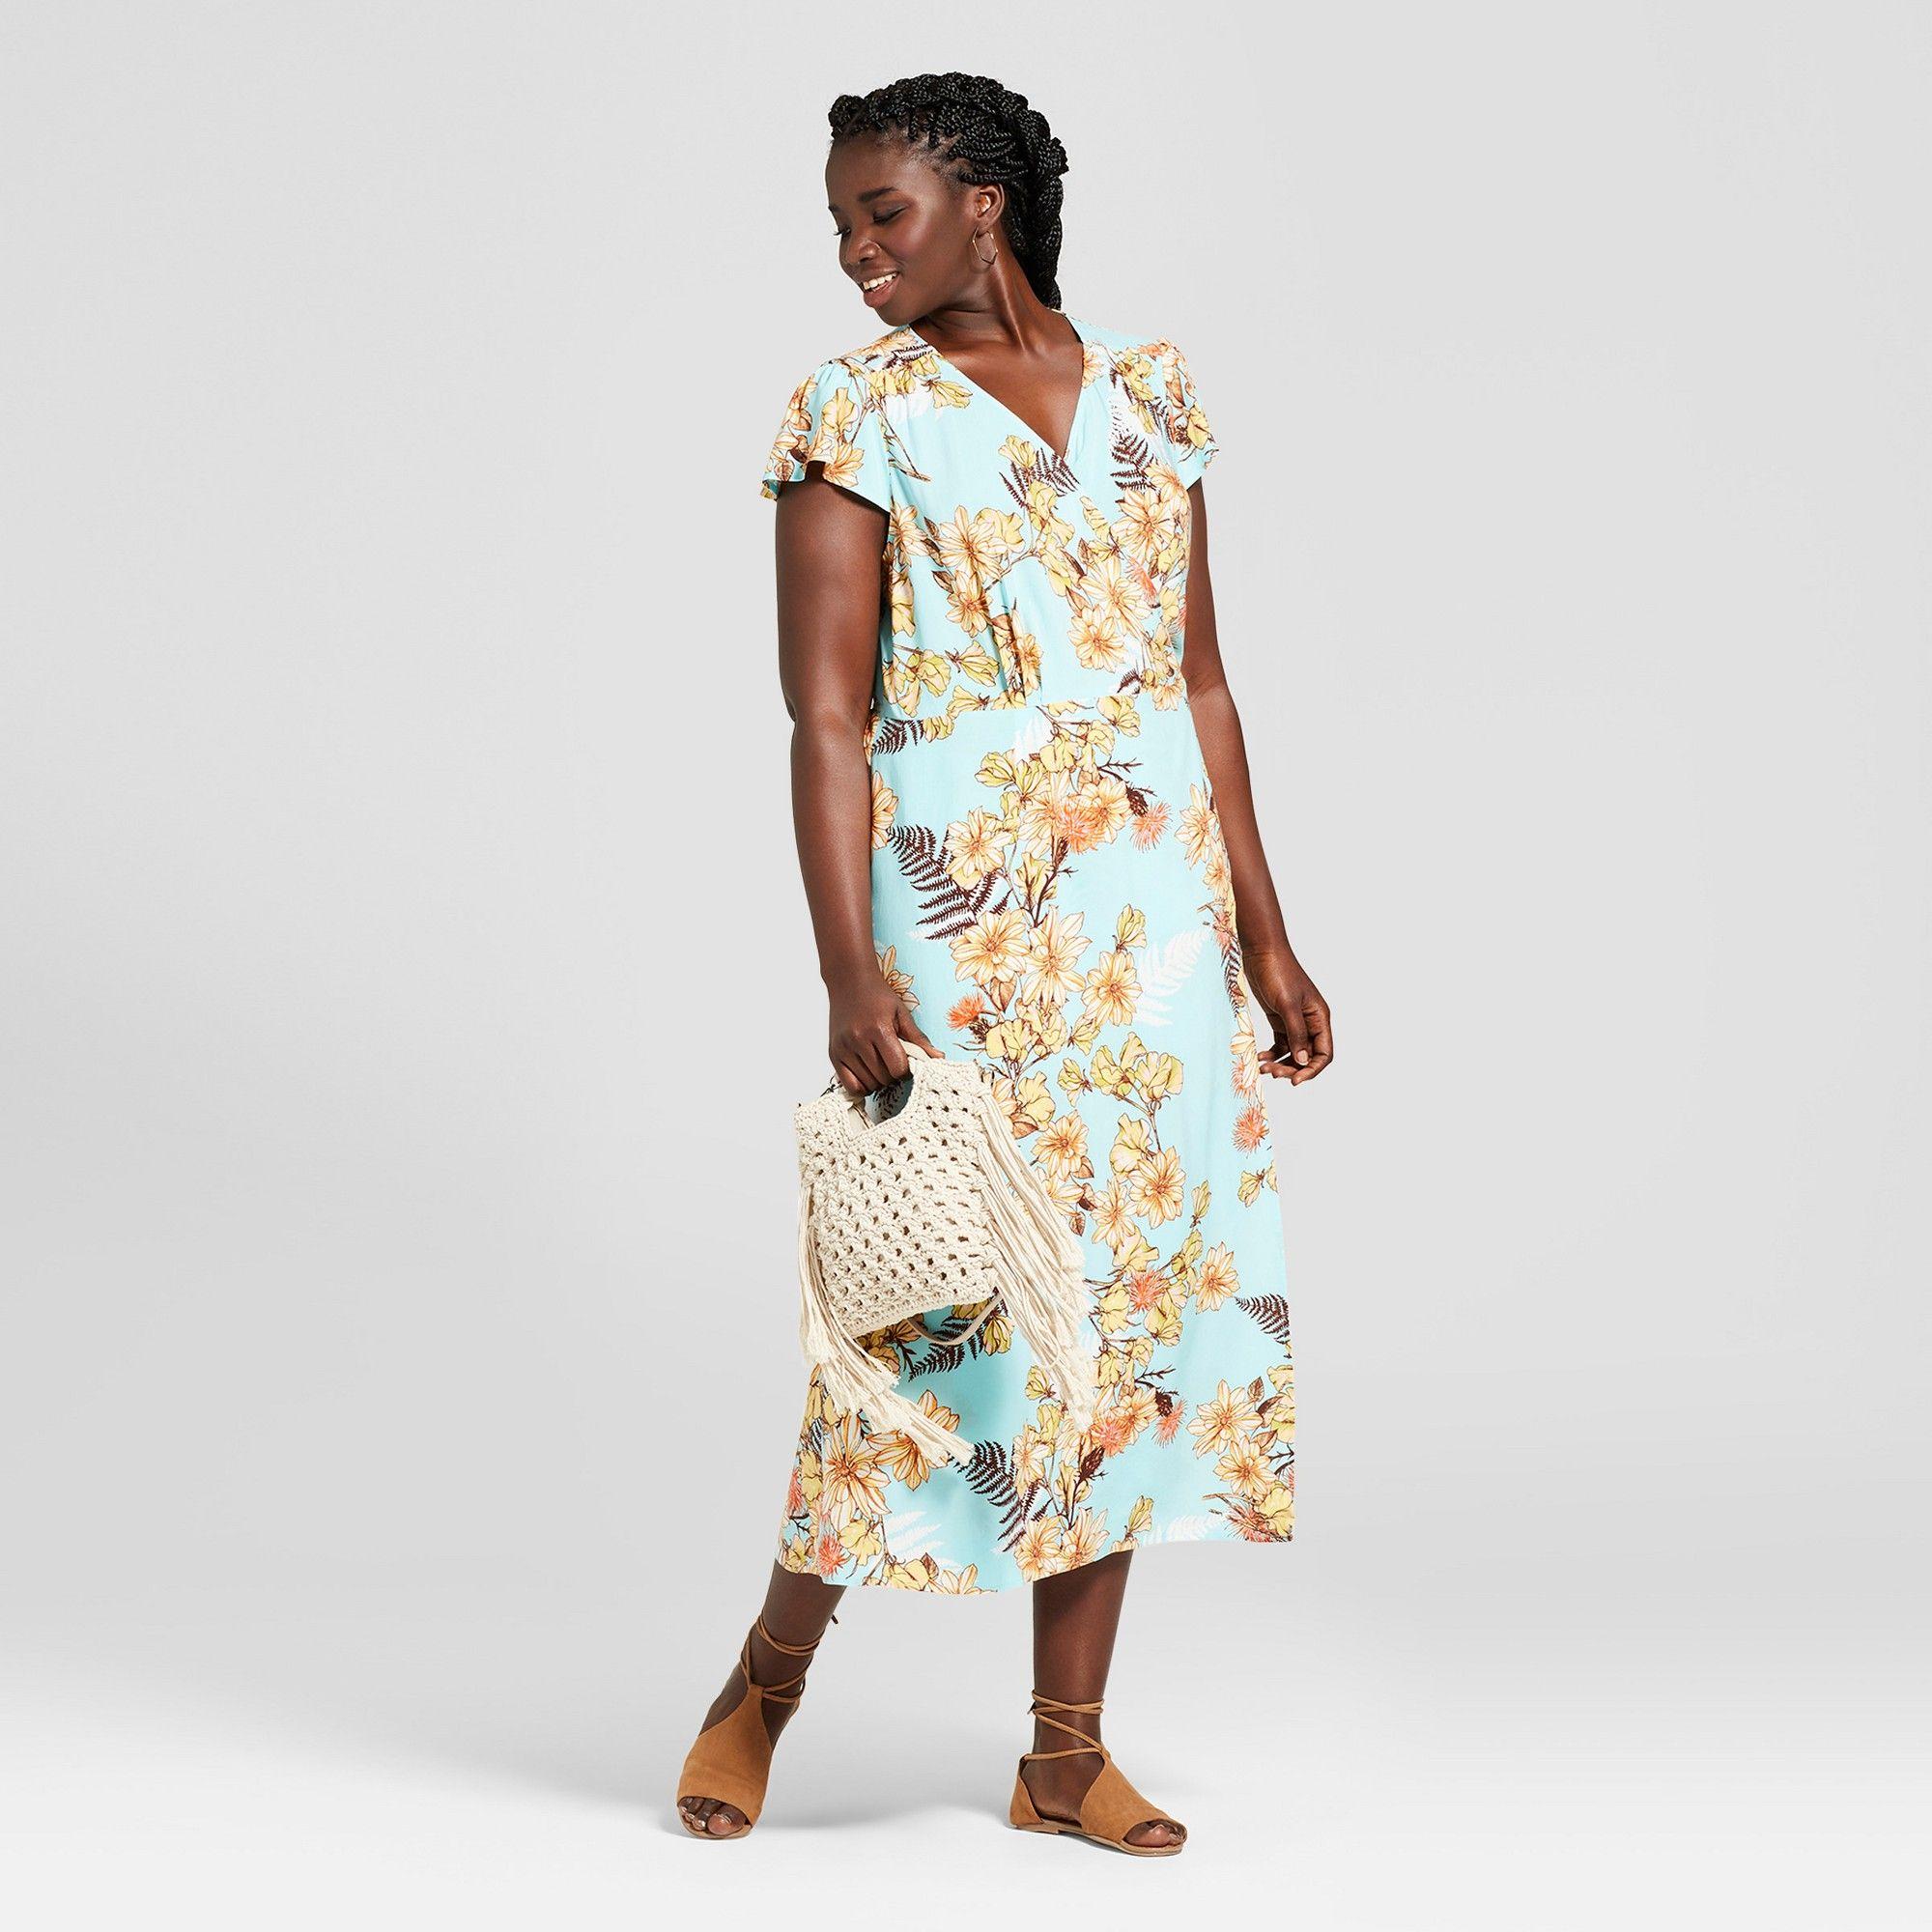 Women S Plus Size Floral Print Short Sleeve Maxi Dress Xhilaration Blue 4x Size Small Maxi Dress With Sleeves Floral Print Shorts 21st Birthday Outfits [ 2000 x 2000 Pixel ]